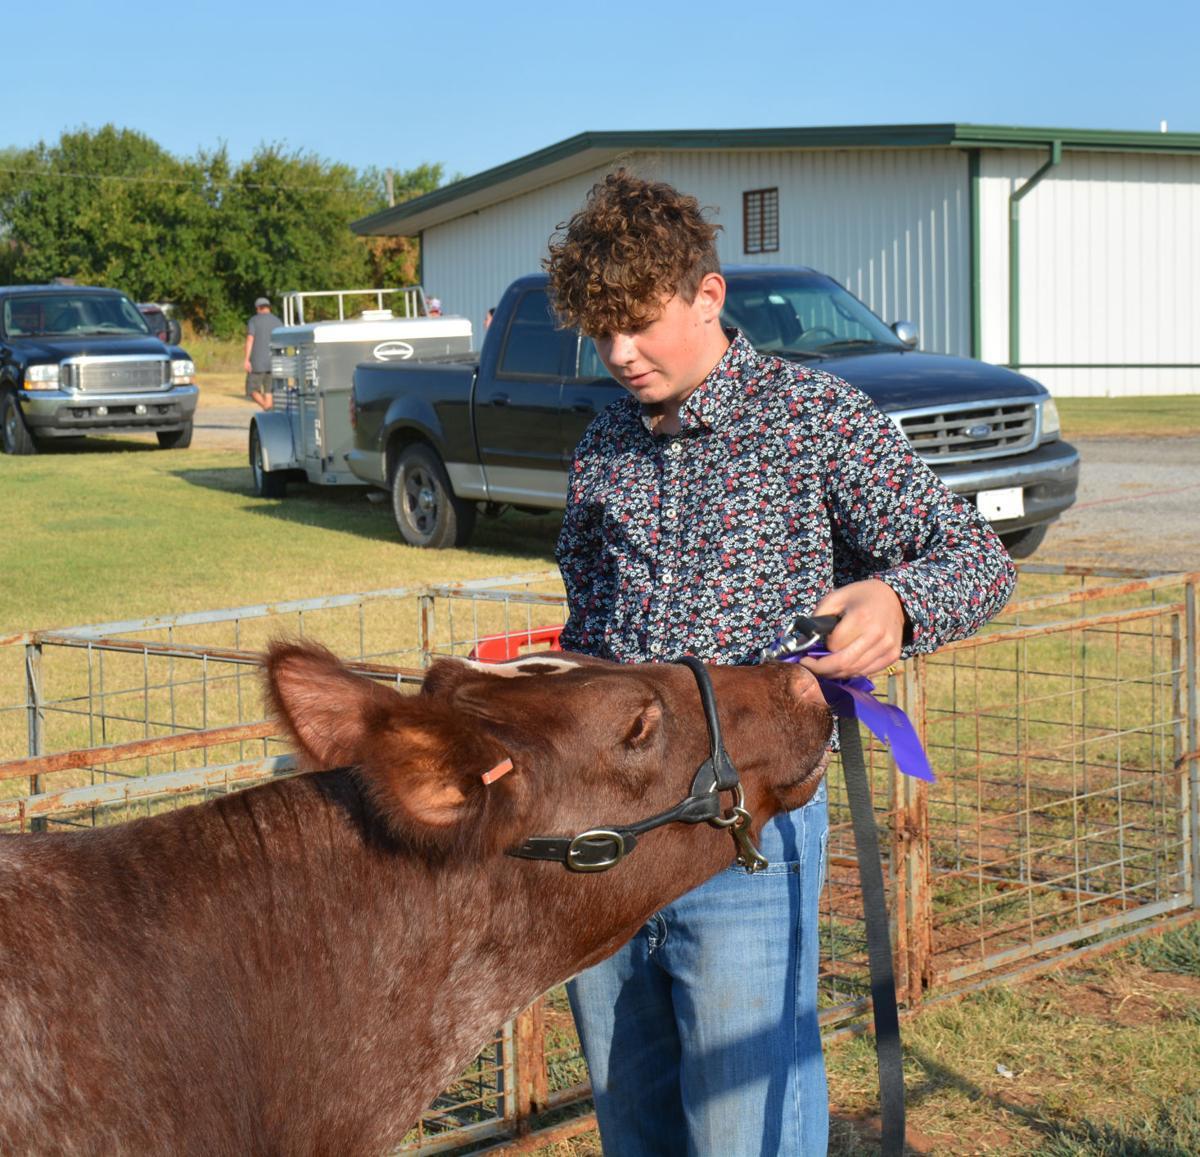 8-21 Cow eat ribbon.jpg